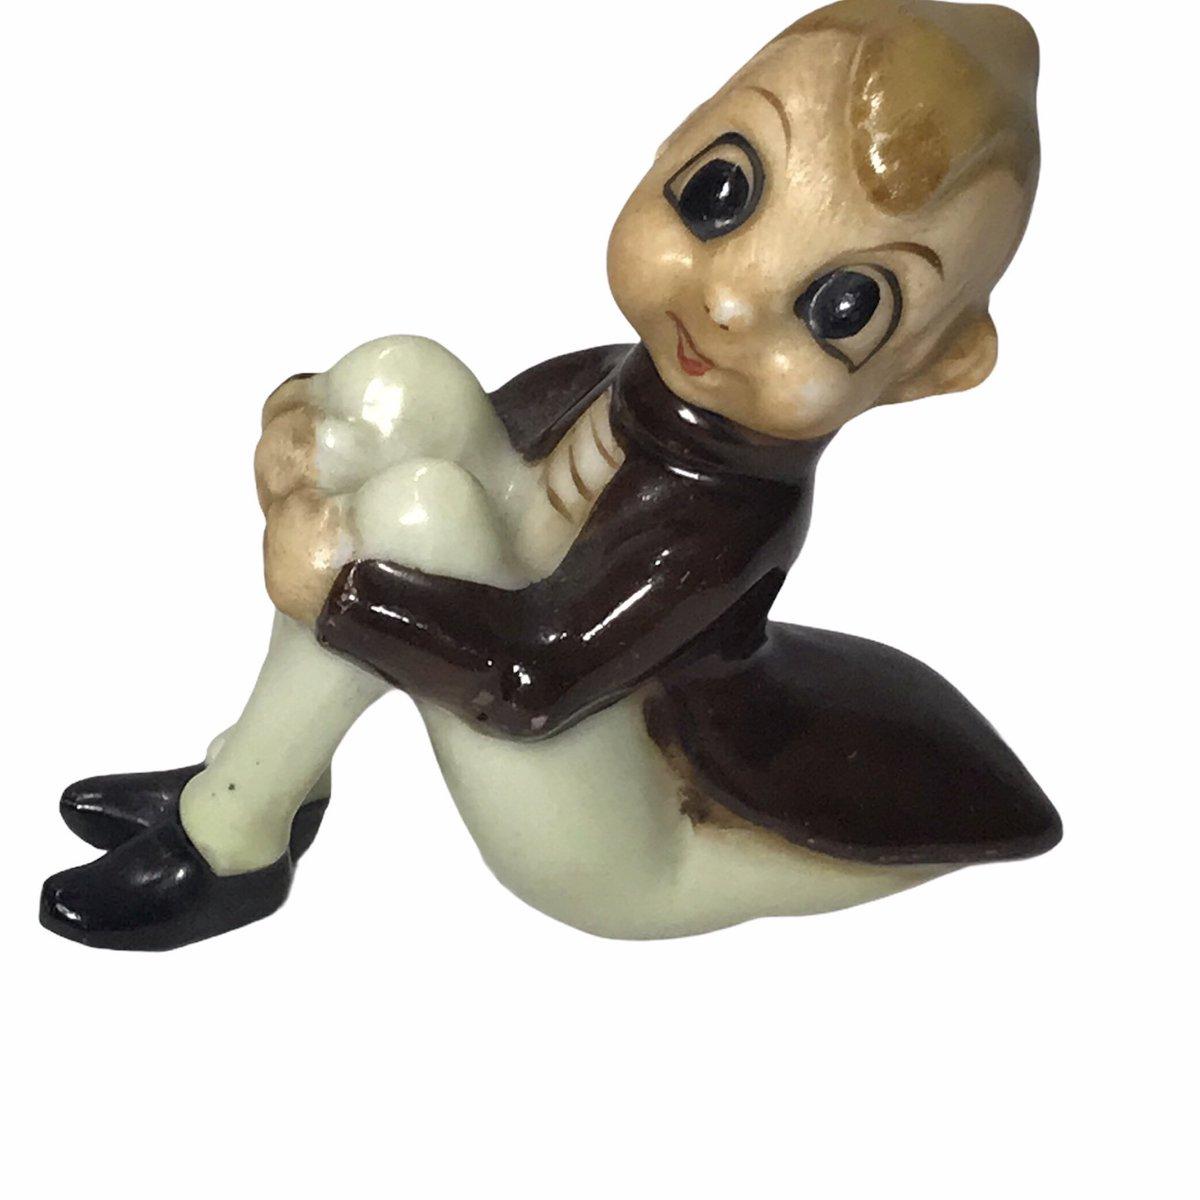 from my #etsy shop: #Anthropomorphic #Pixie Elf Figurine Cricket Bug Japan Glazed  #vintage #japancollectables #shelfsitter #roosretroboutique #shopsmall #shoponline #reselling